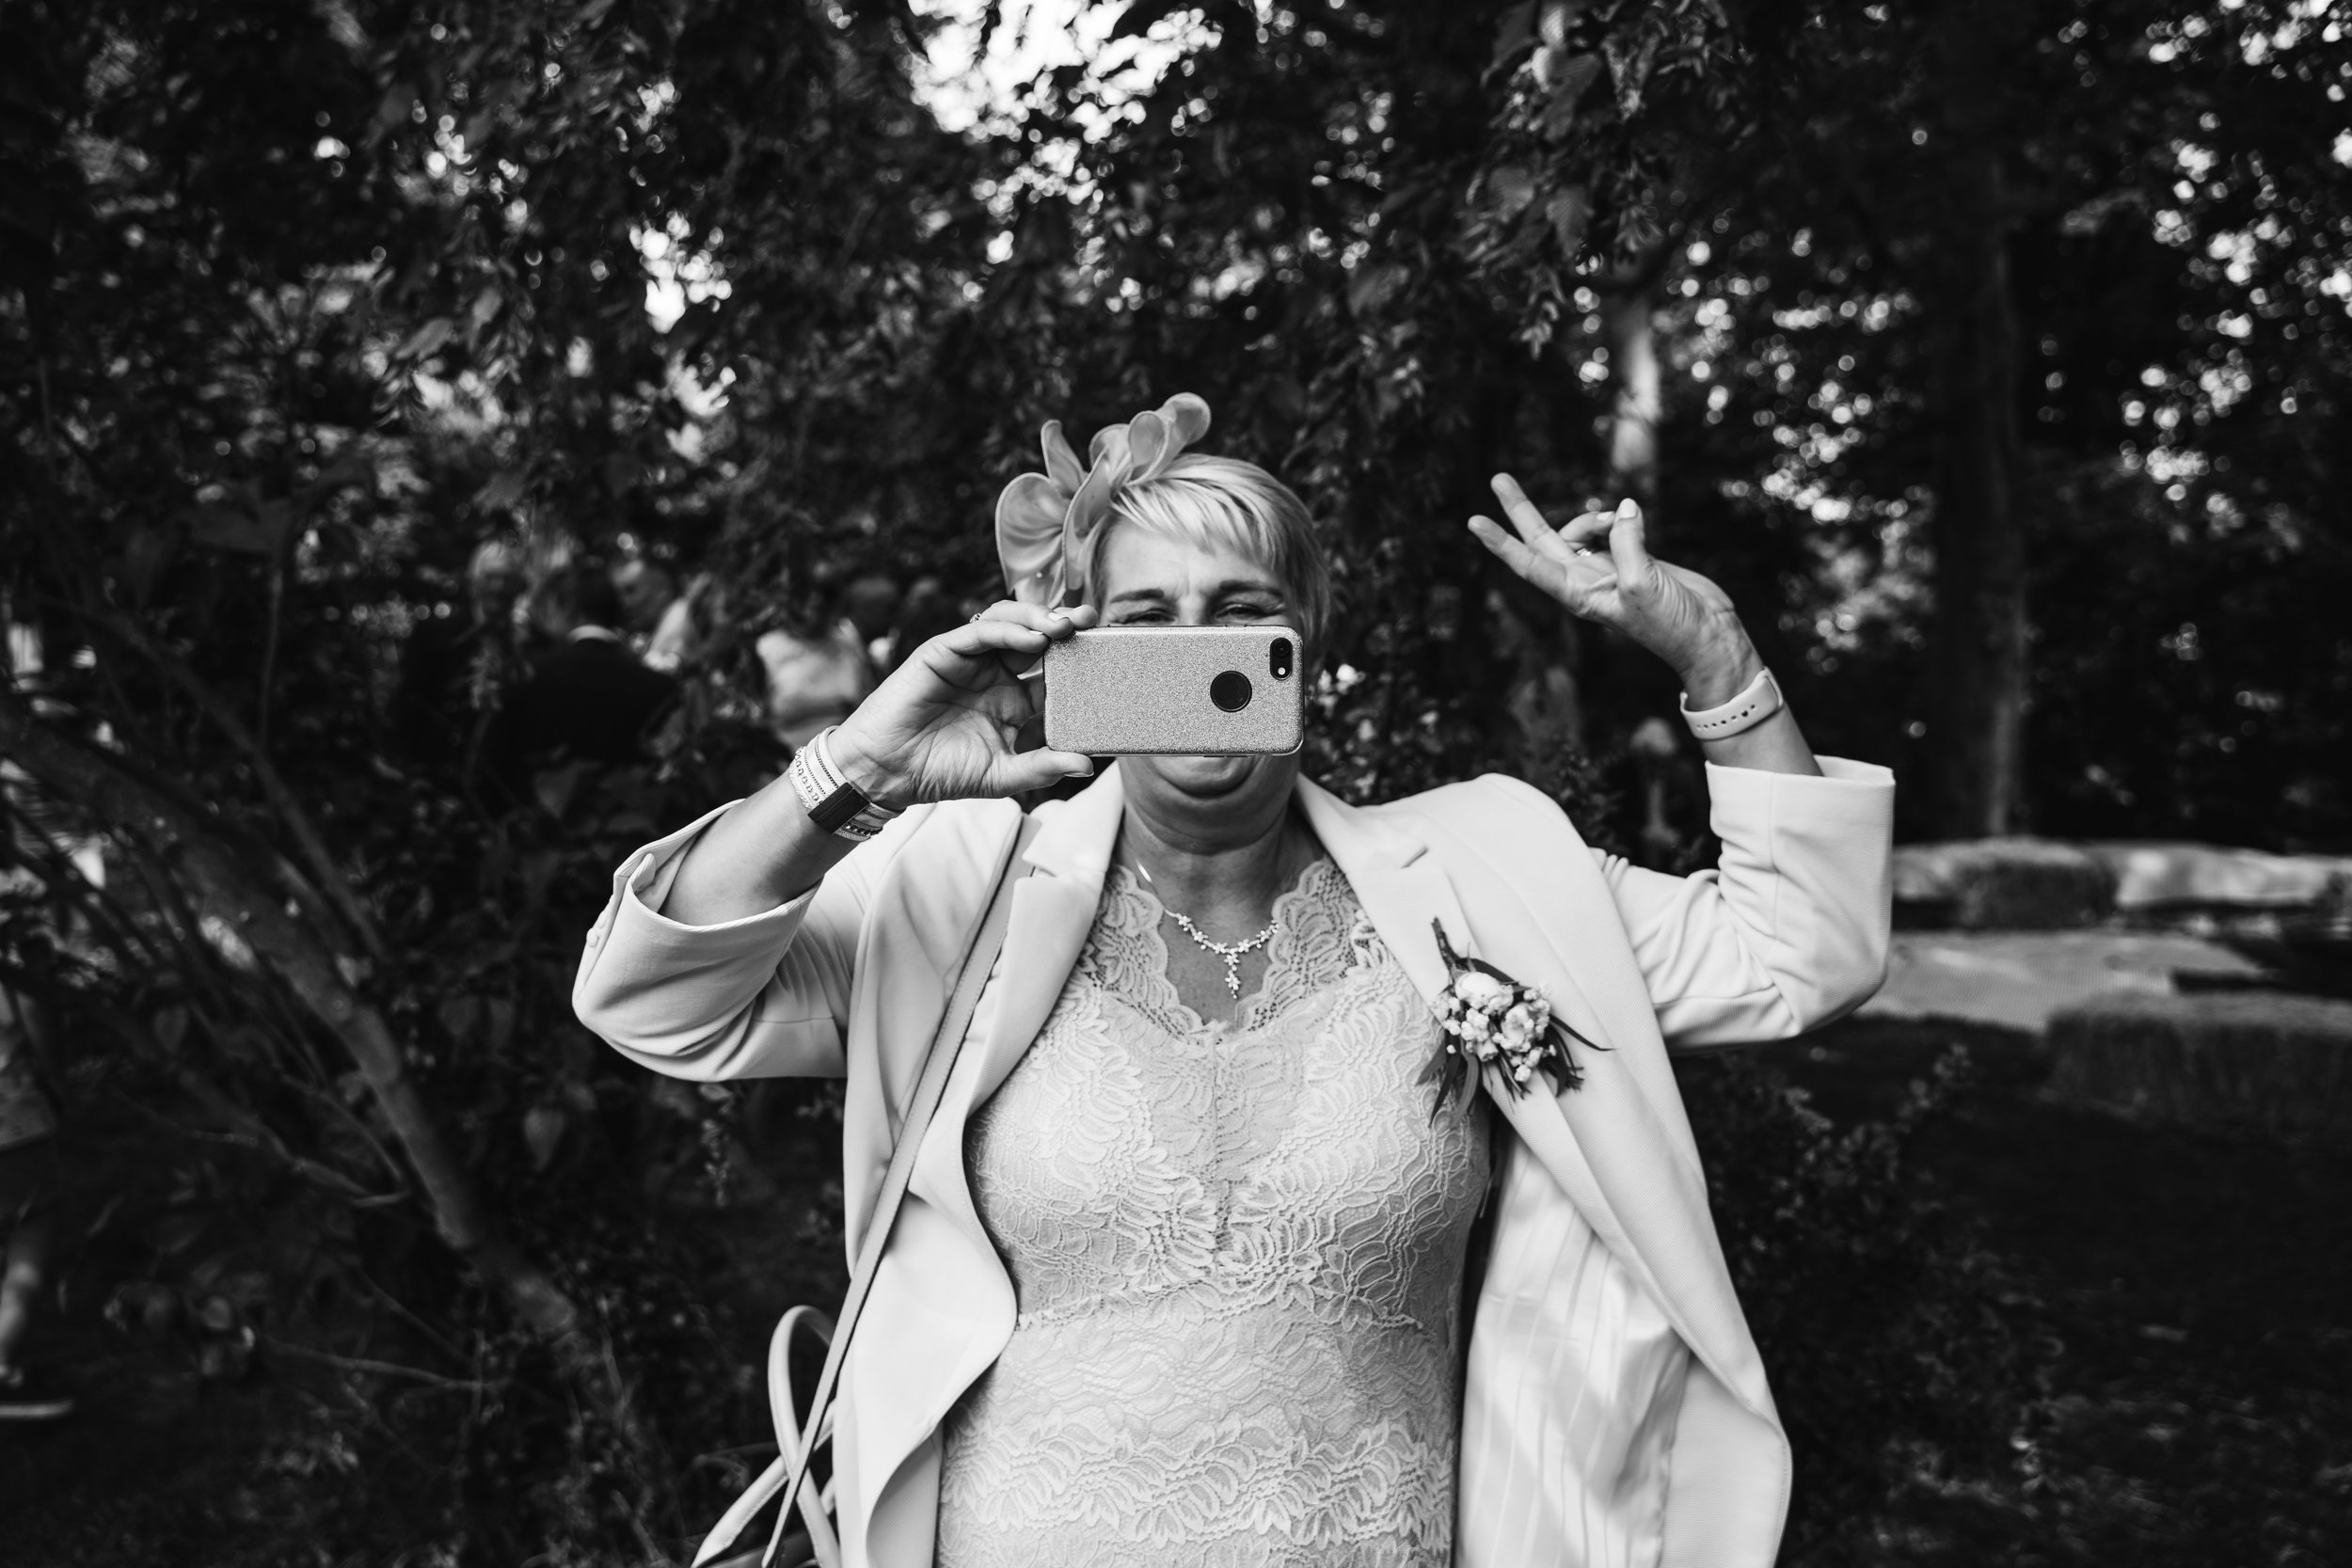 kent-wedding-photographer-104879.jpg